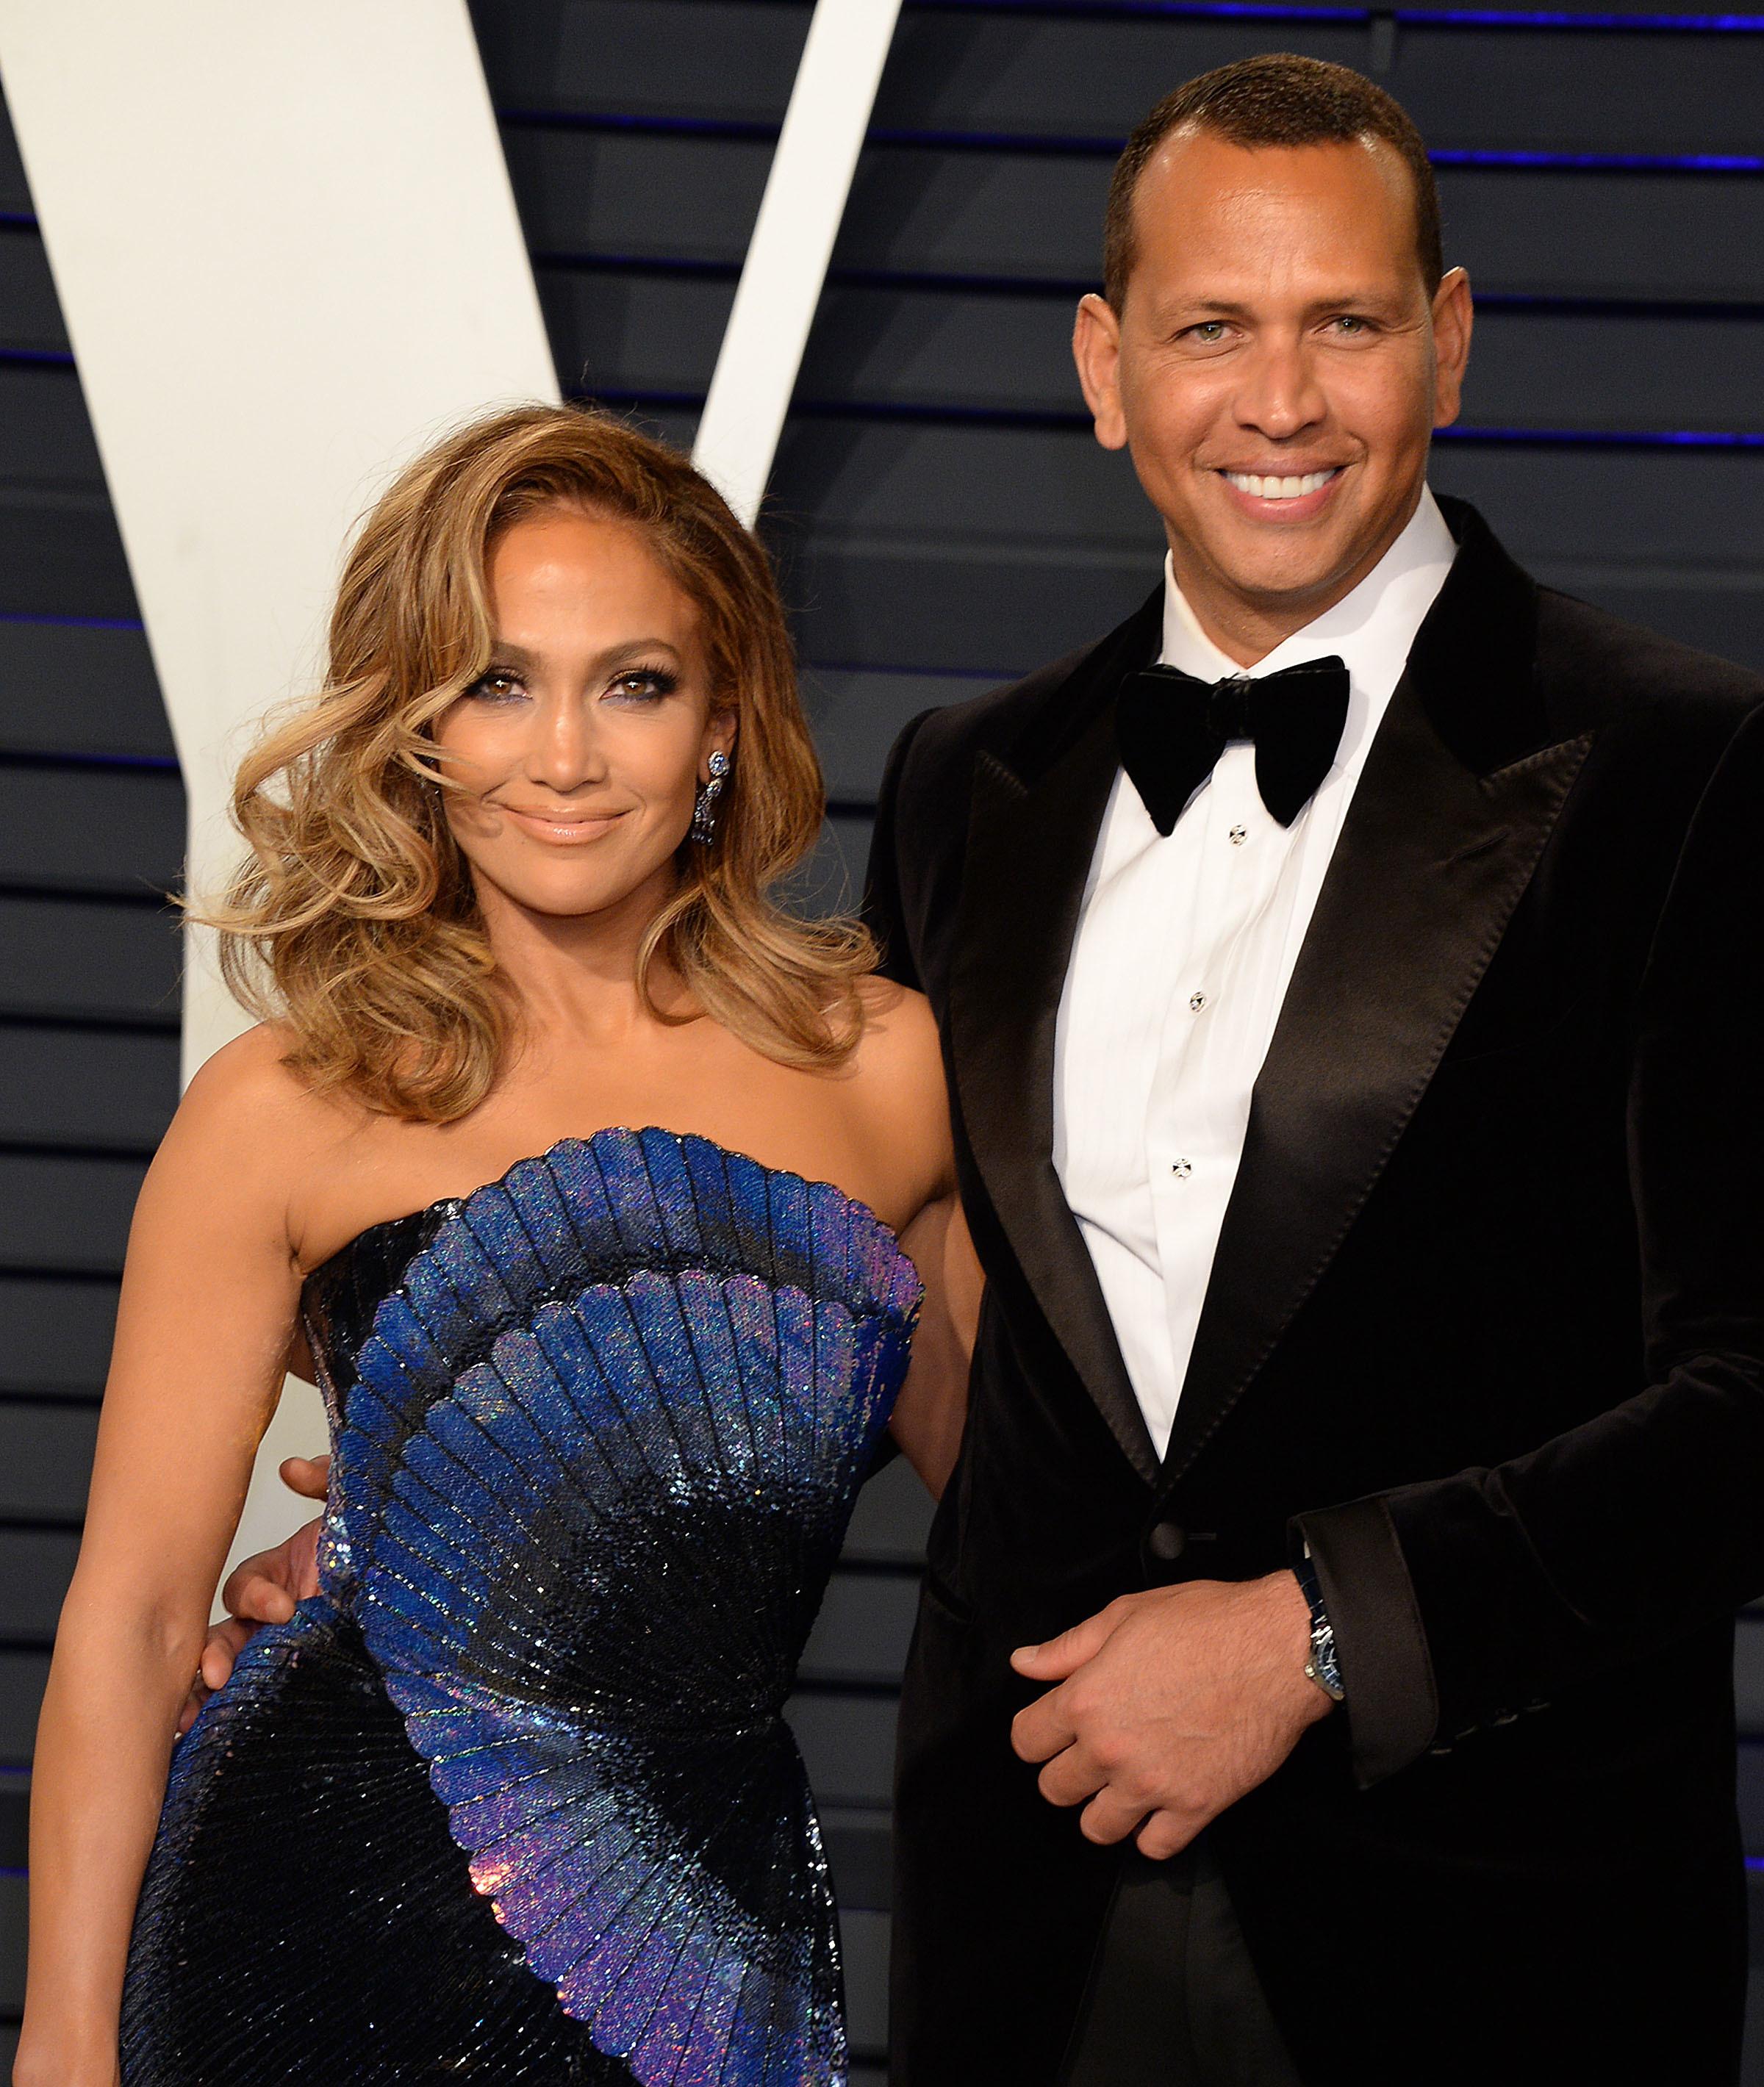 Jennifer Lopez Alex Rodriguez Mets Deal Buzz Grows Louder More News Gallery Wonderwall Com